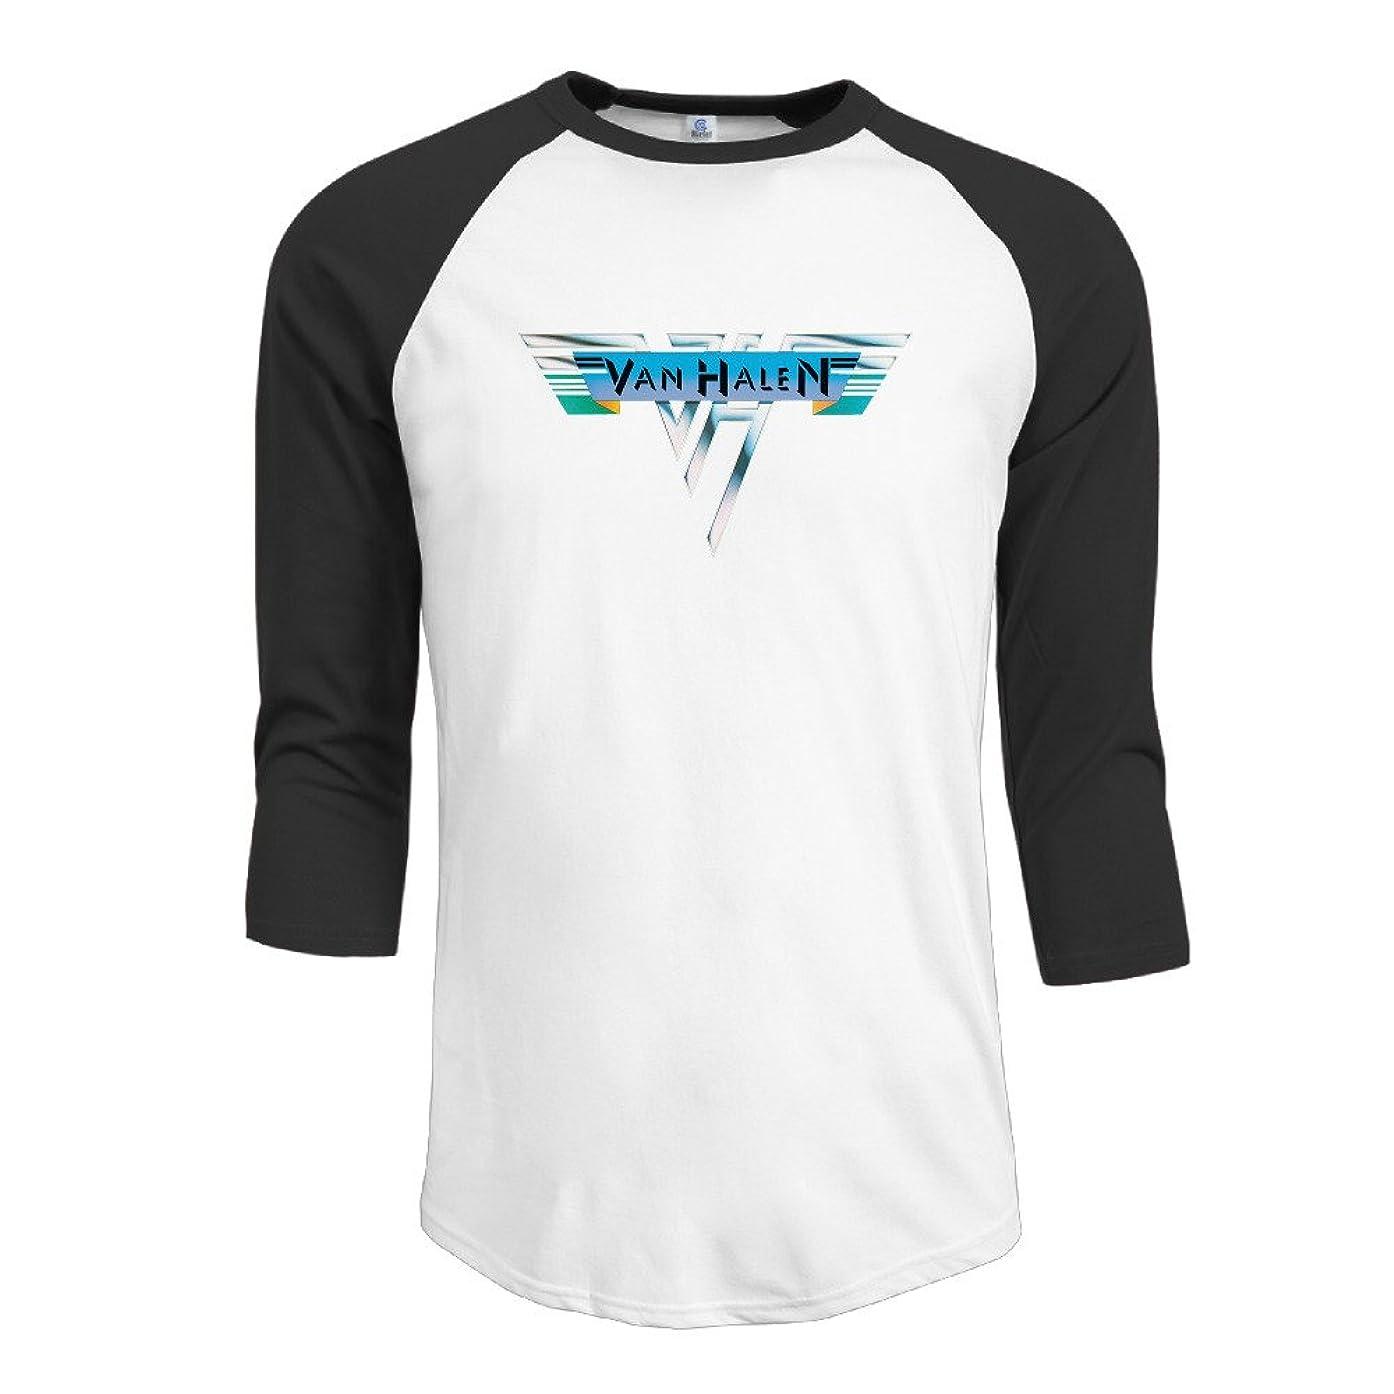 Men The Collection Album Van Halen Vintage 3/4 Sleeve Baseball T Shirts